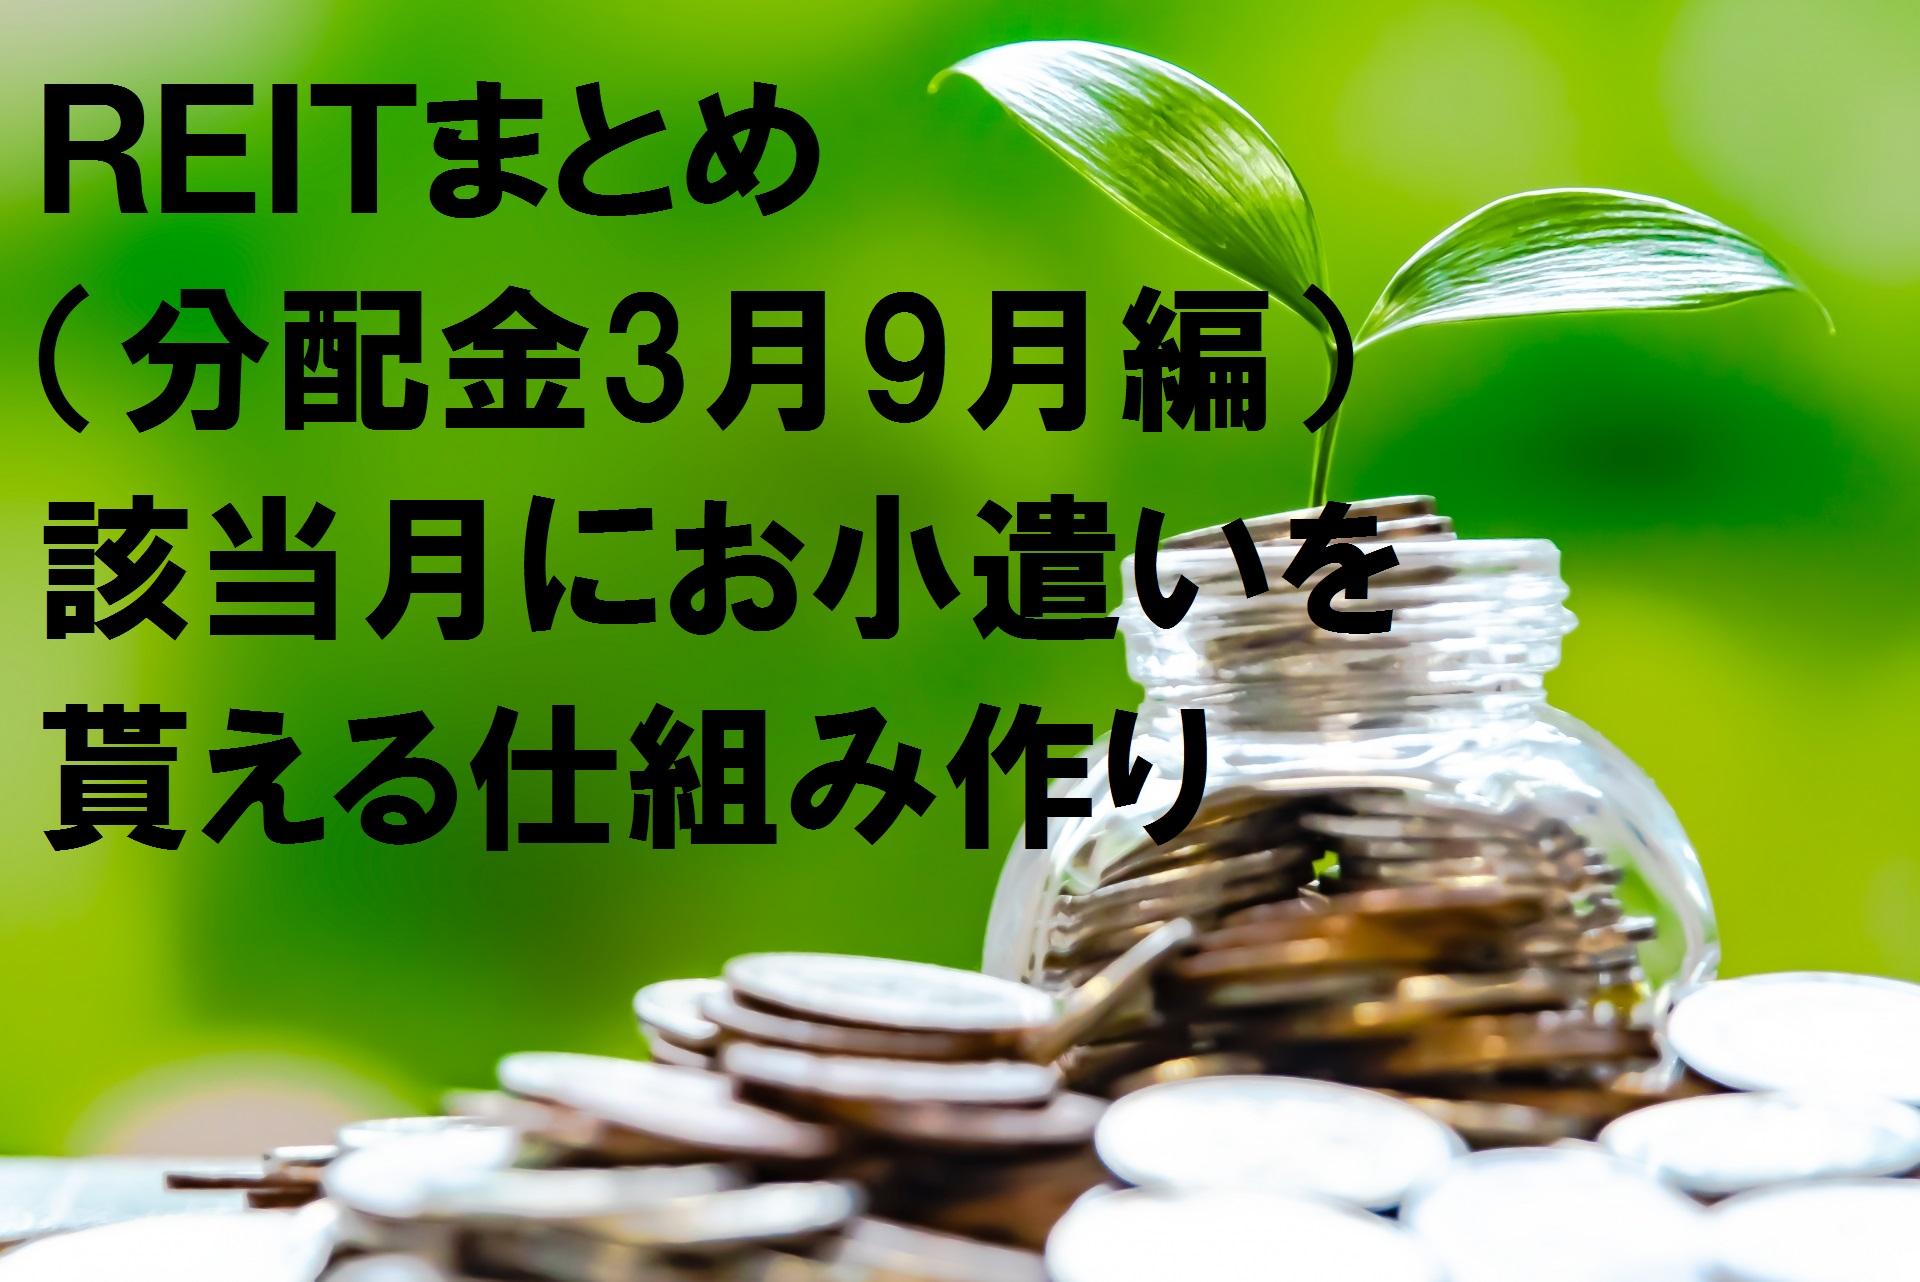 REITまとめ(分配金3月9月編)該当月にお小遣いを貰える仕組み作り